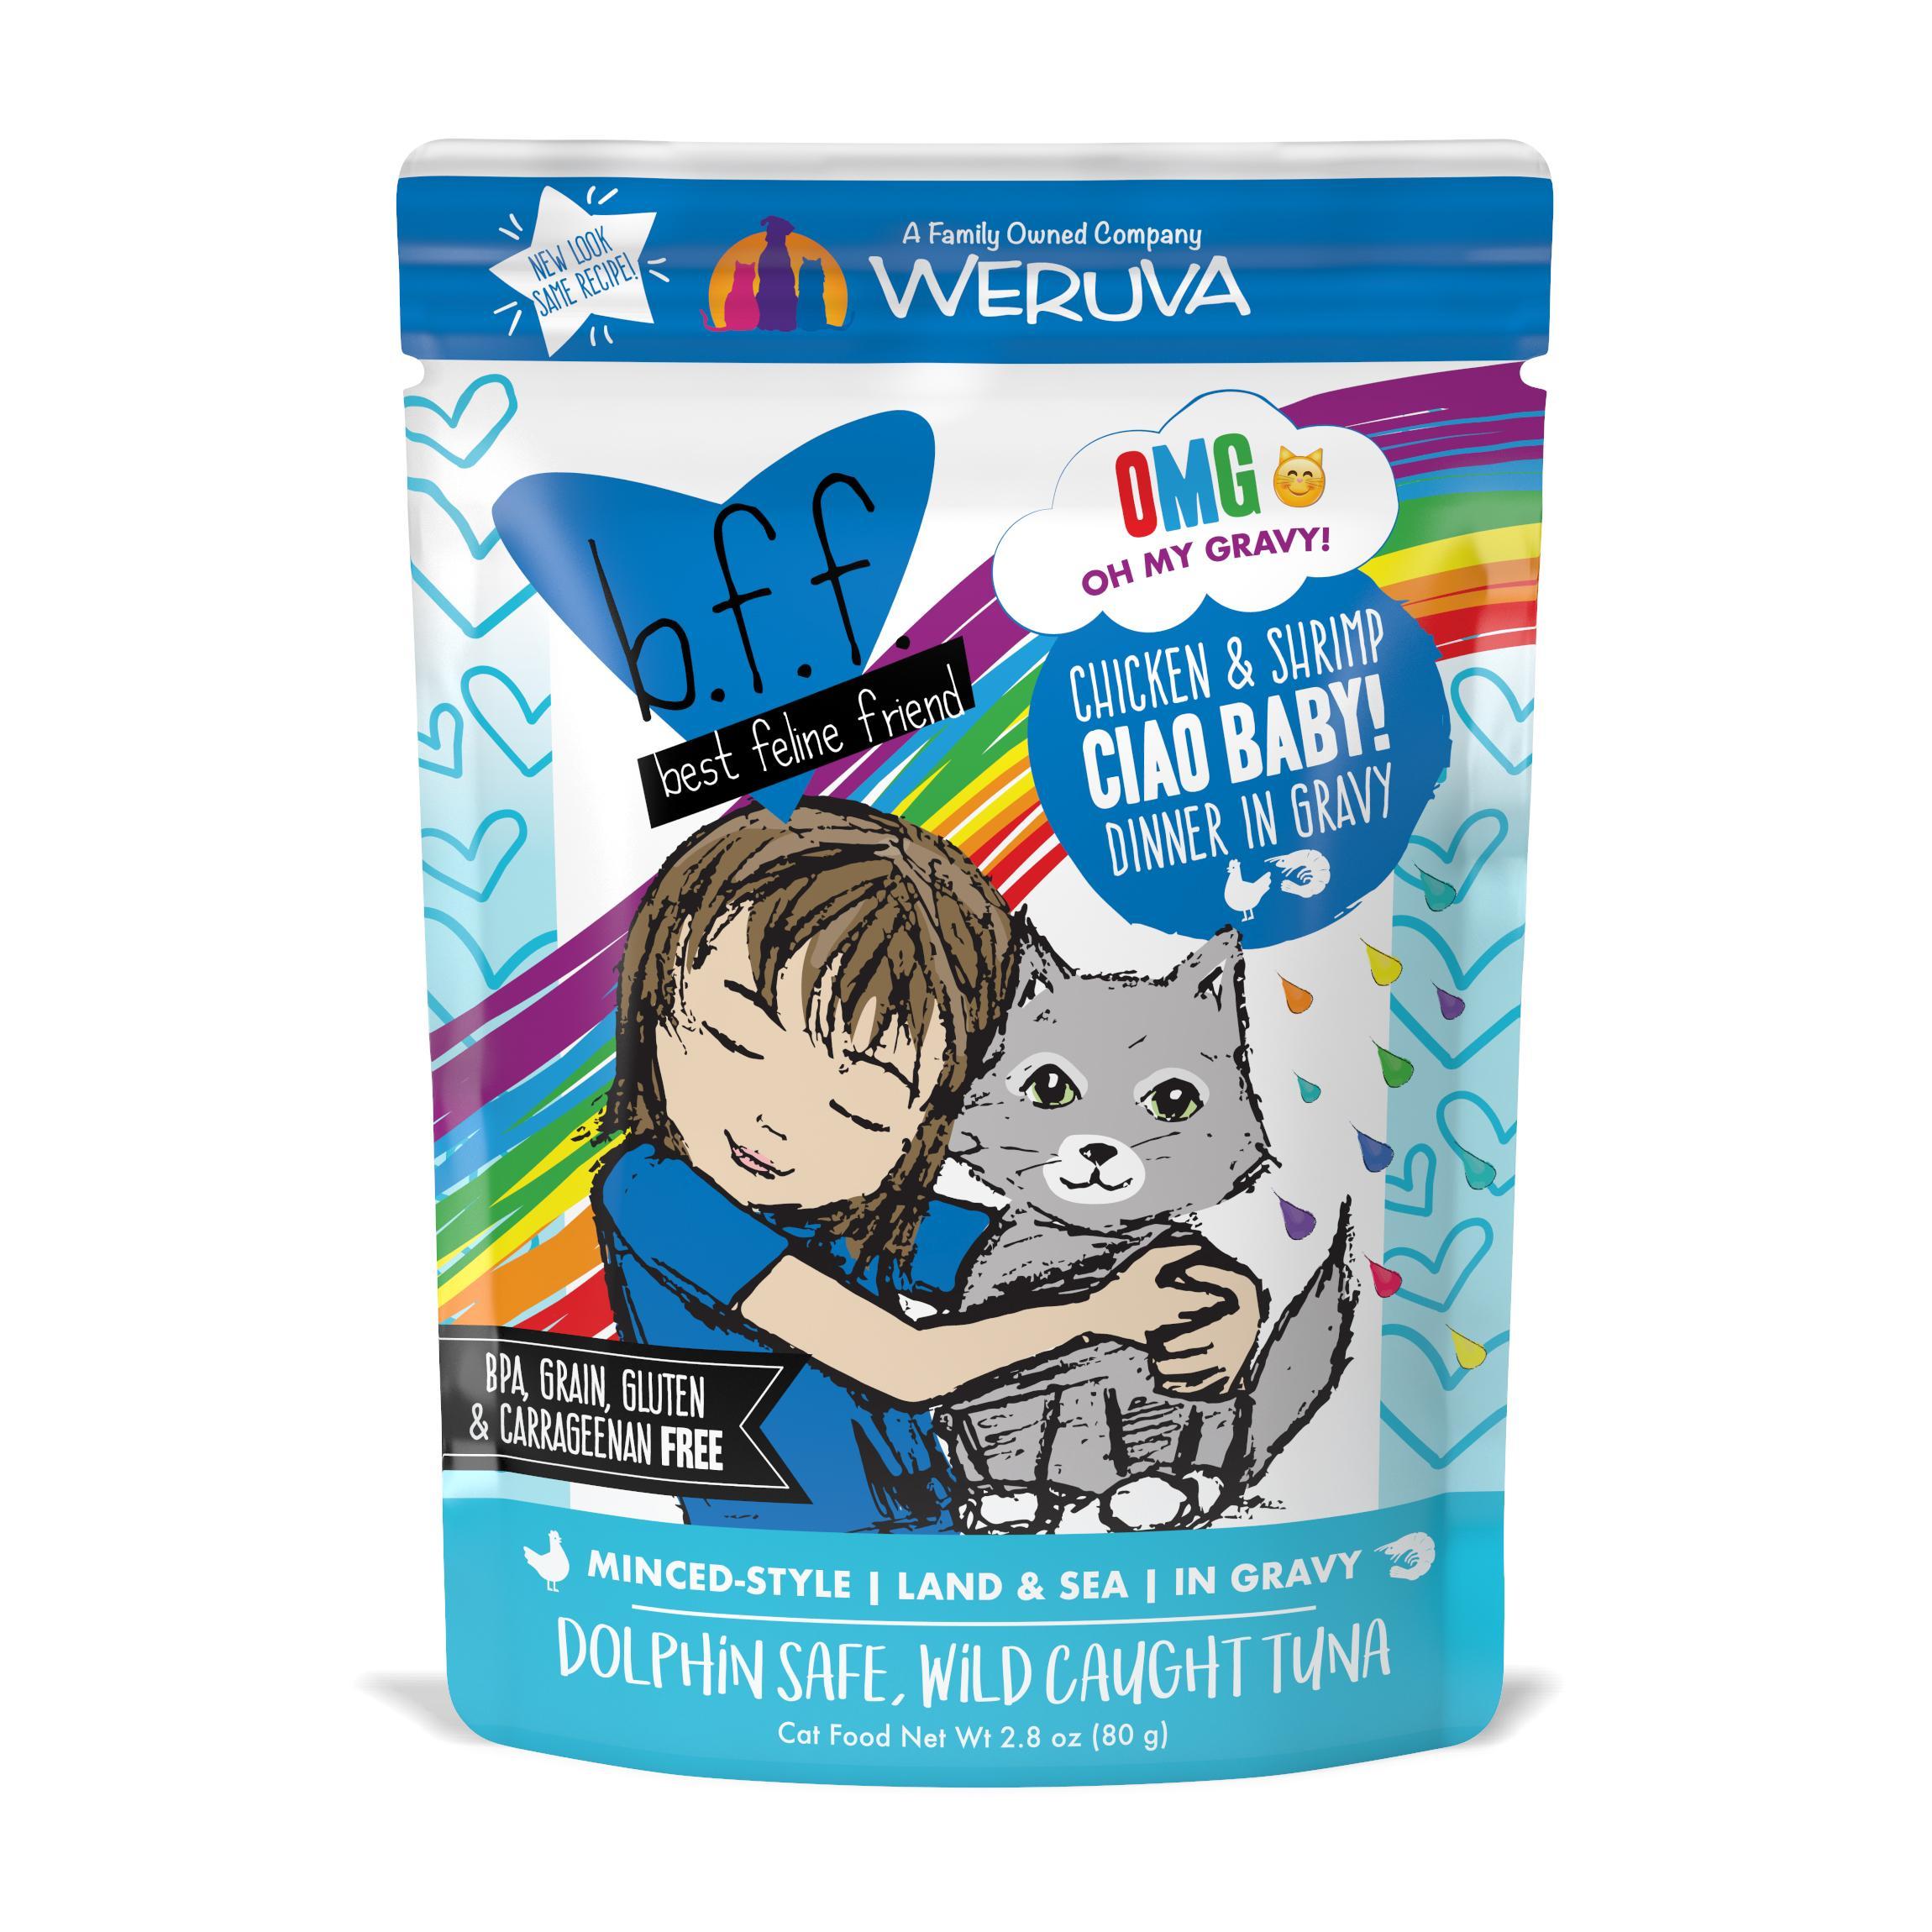 BFF Oh My Gravy! Ciao Baby! Chicken & Shrimp Dinner in Gravy Grain-Free Wet Cat Food Image